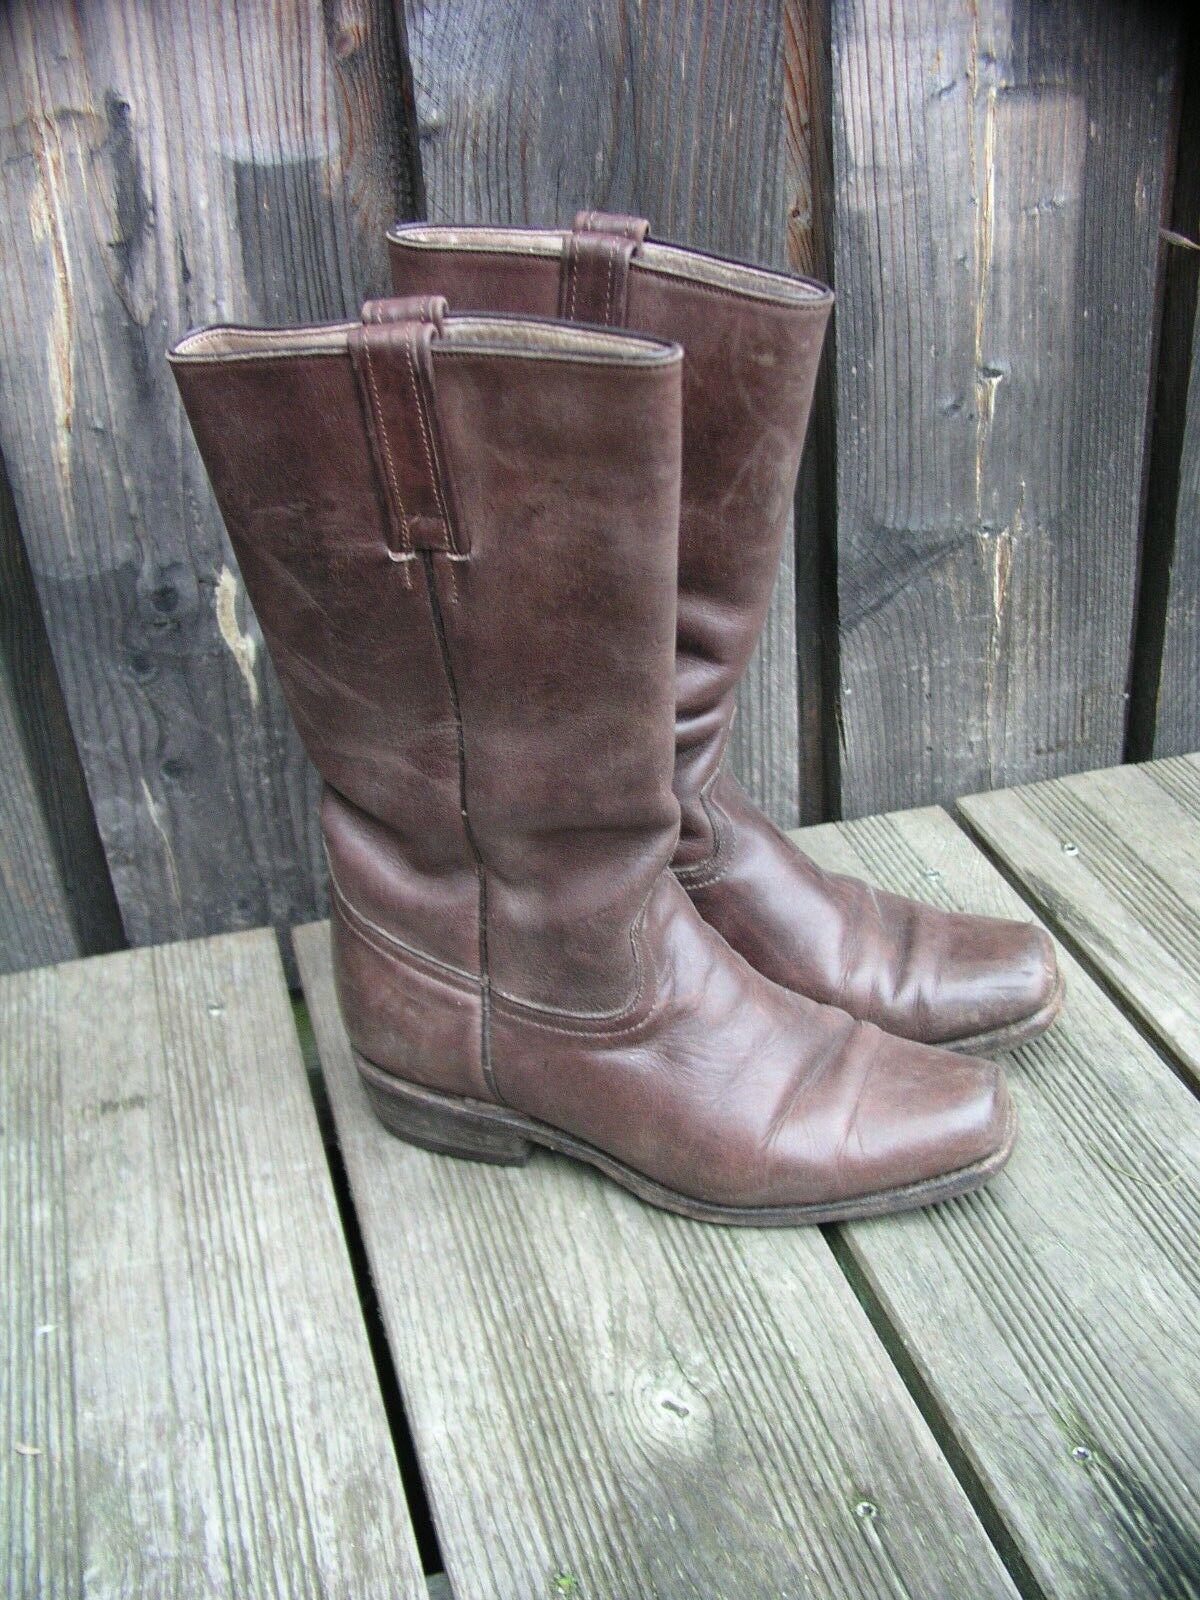 Cowboystiefel Gr. 38 c04cdwvme52830 Stiefel & Stiefeletten